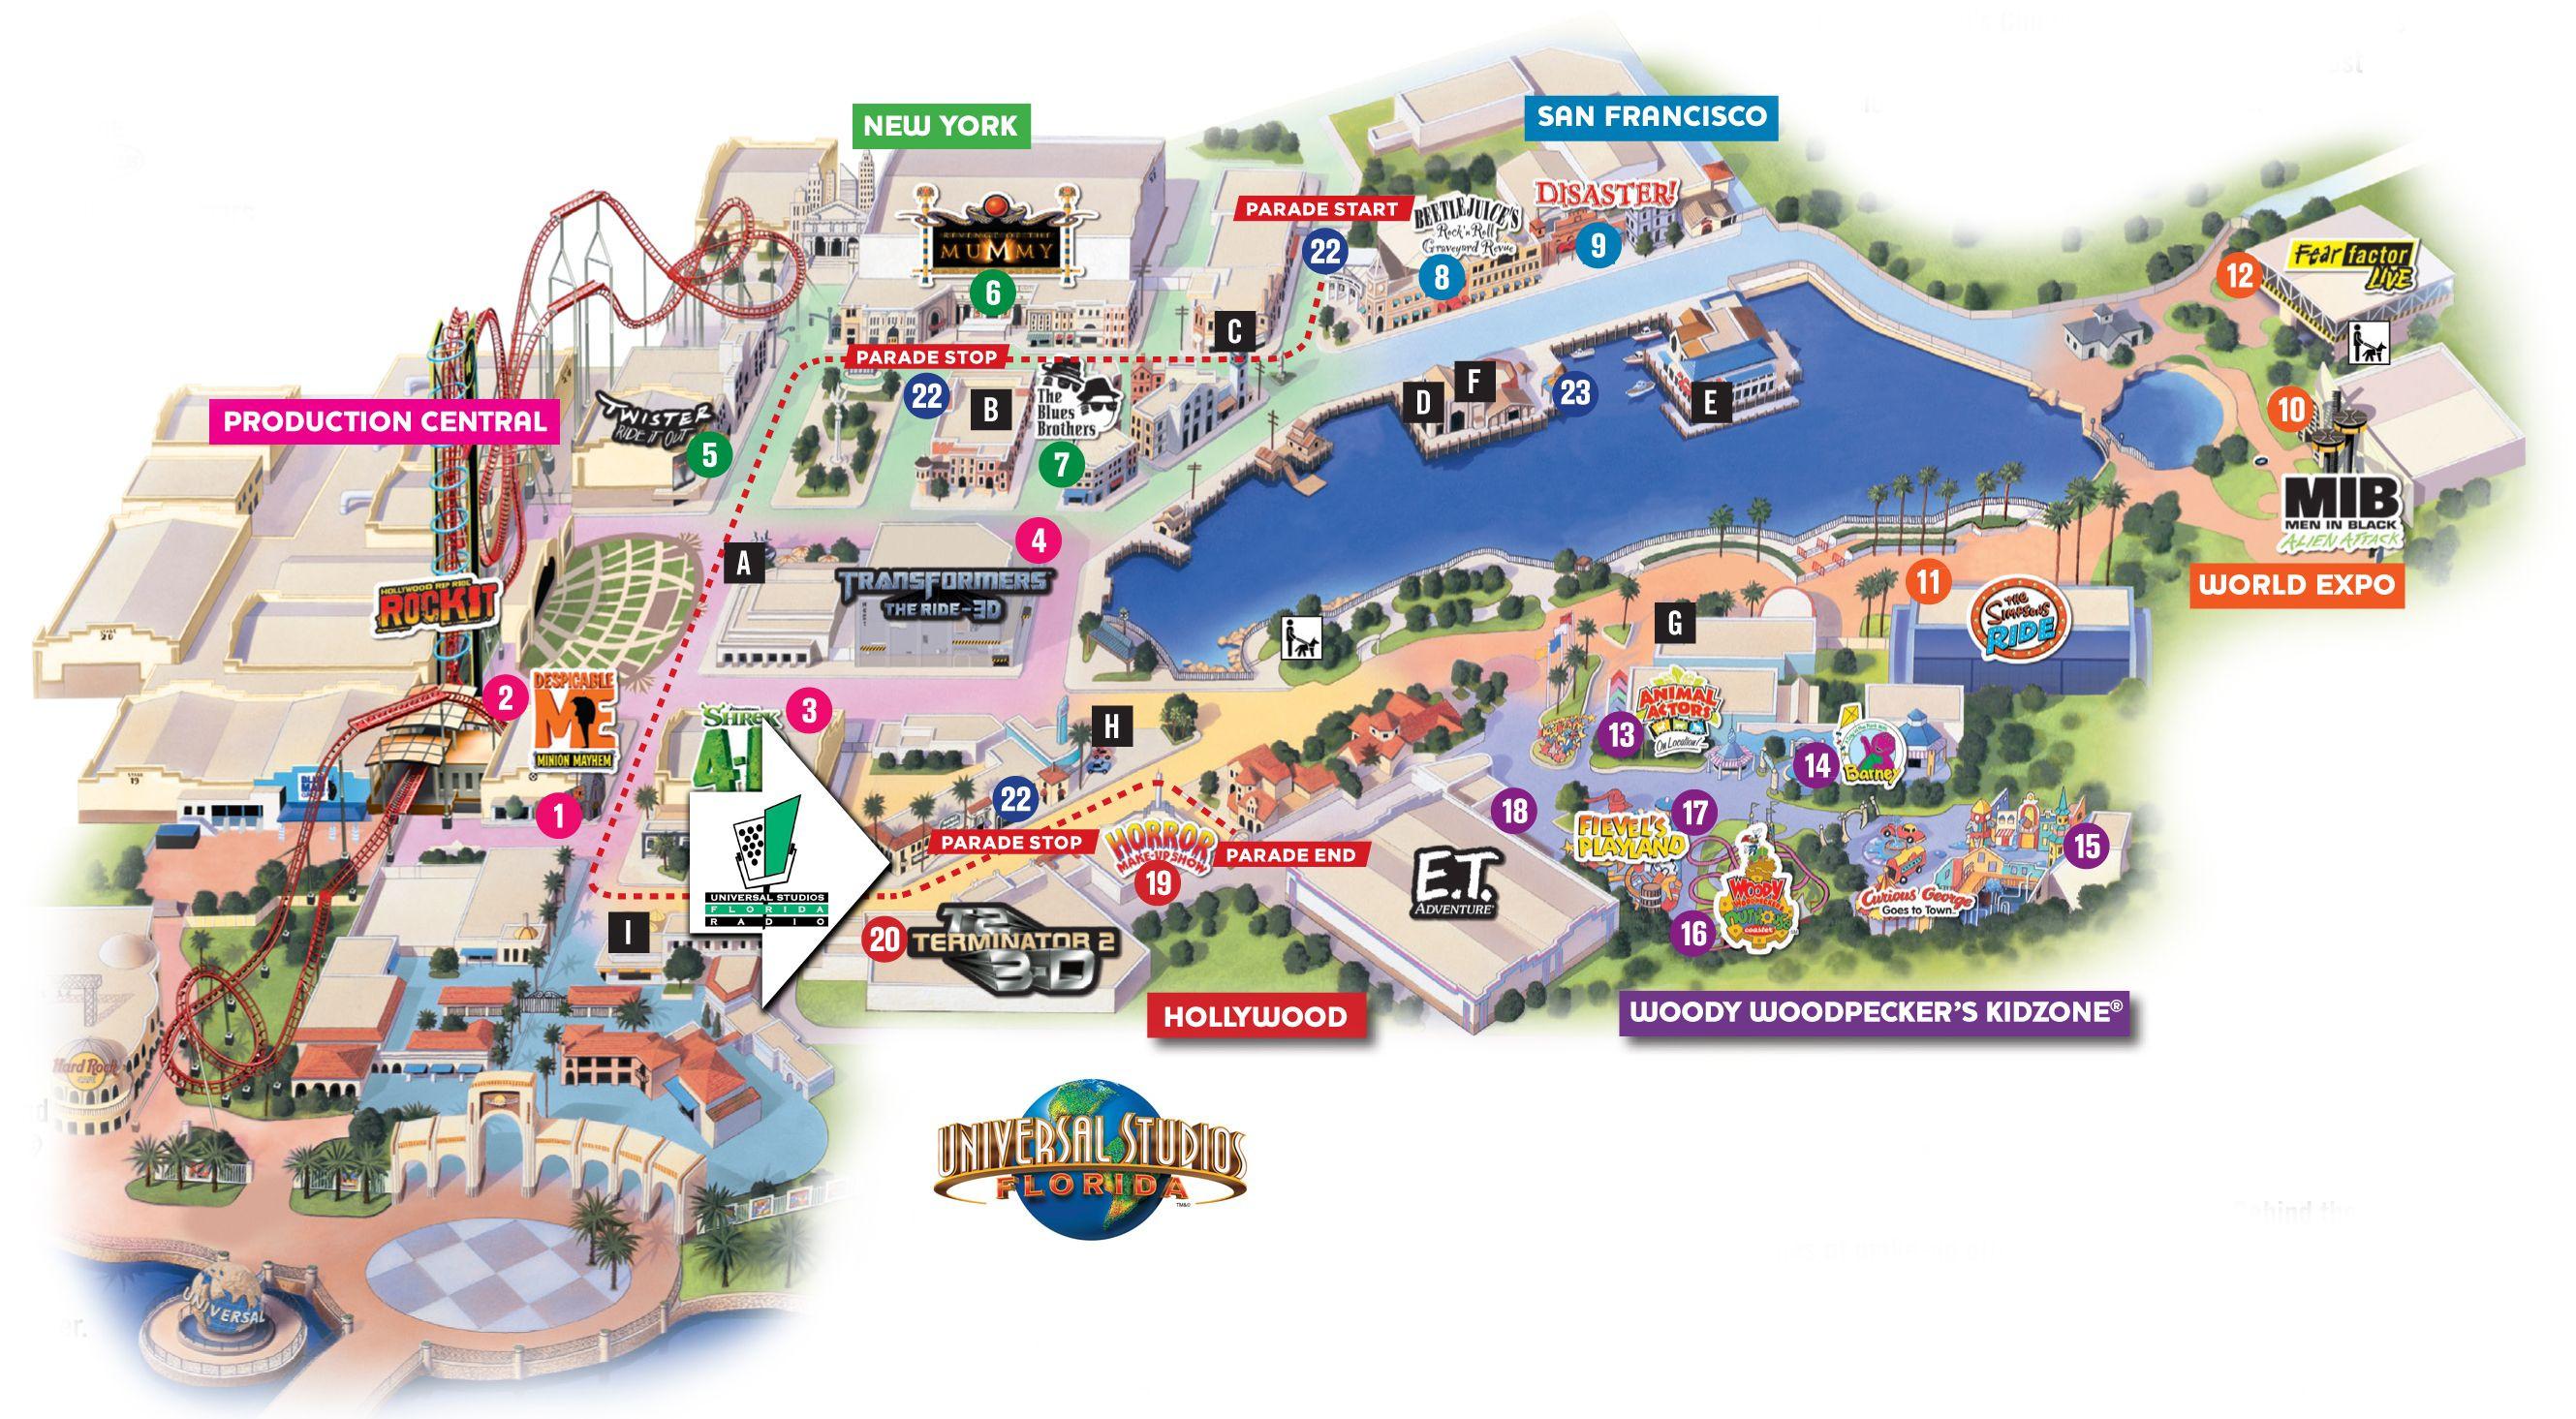 Universal Studios California Park Map Updated Universal Studios - Universal Studios Florida Map 2018